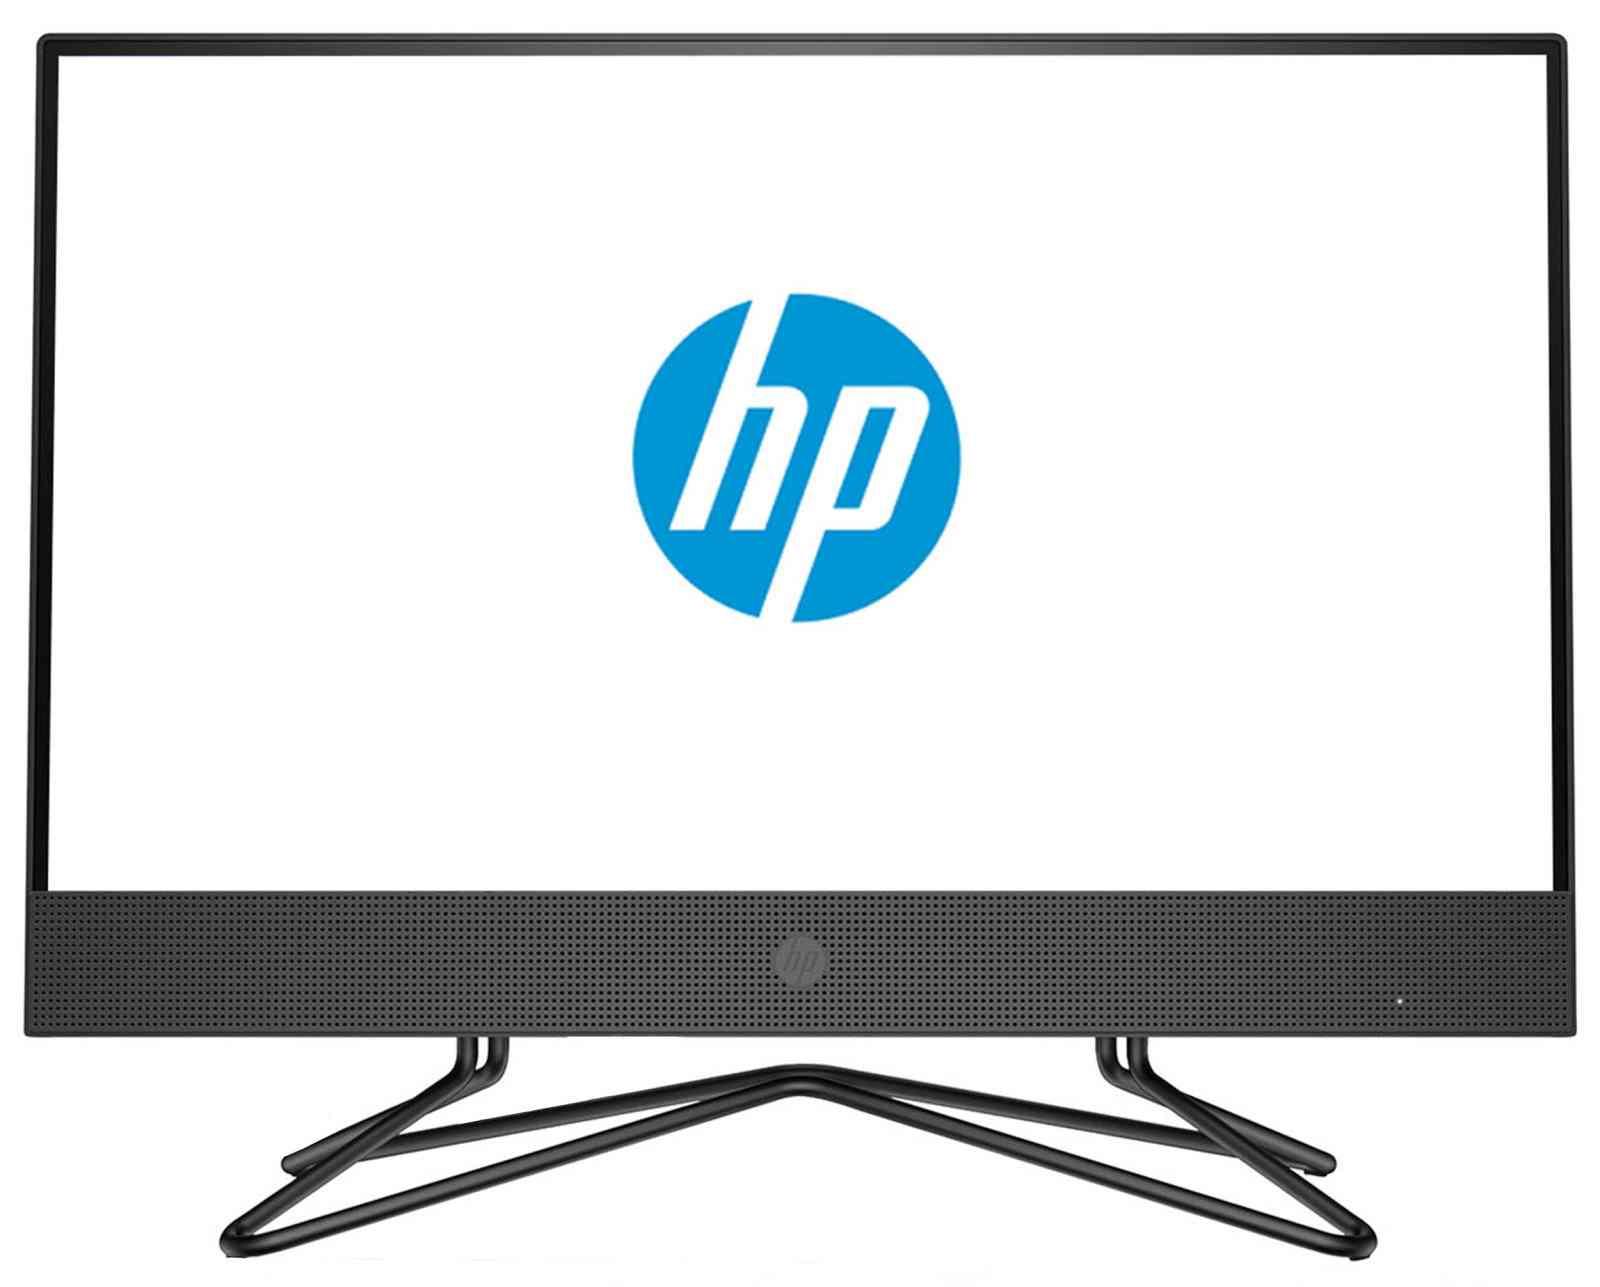 HP 22-inch All-in-One Desktop Computer